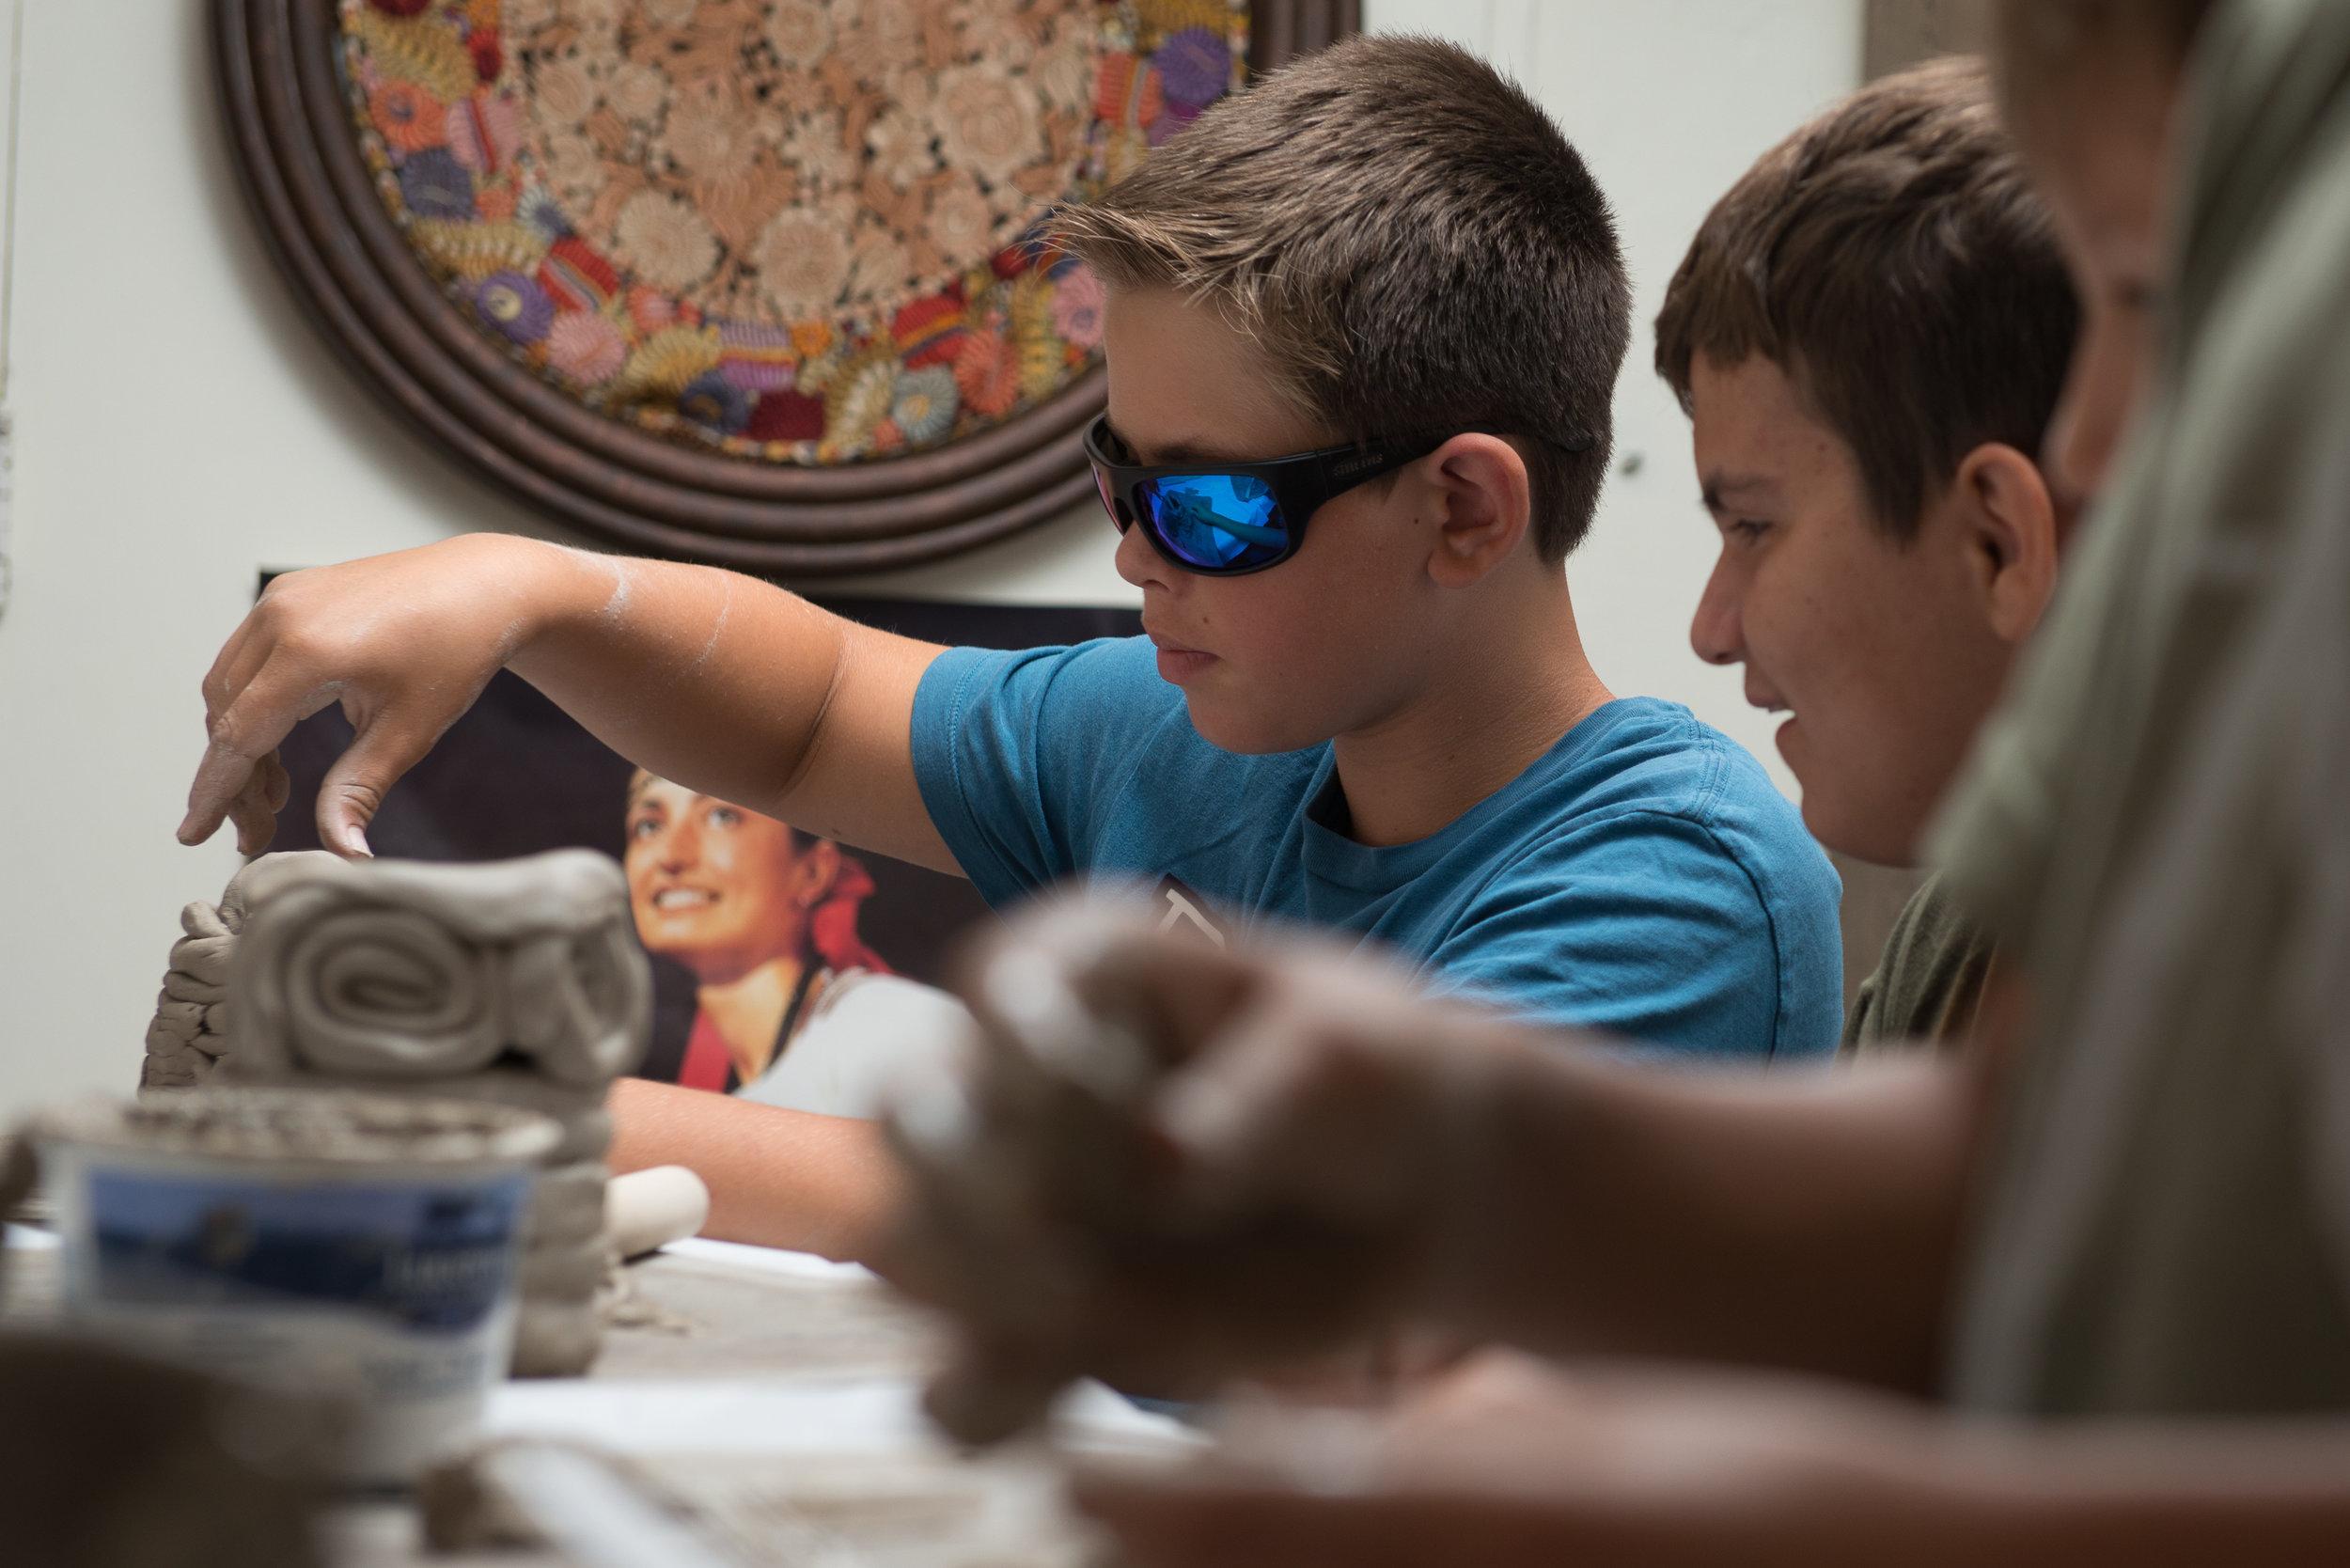 San Diego Kids Summer Art Camp Balboa Park 2017-15.jpg